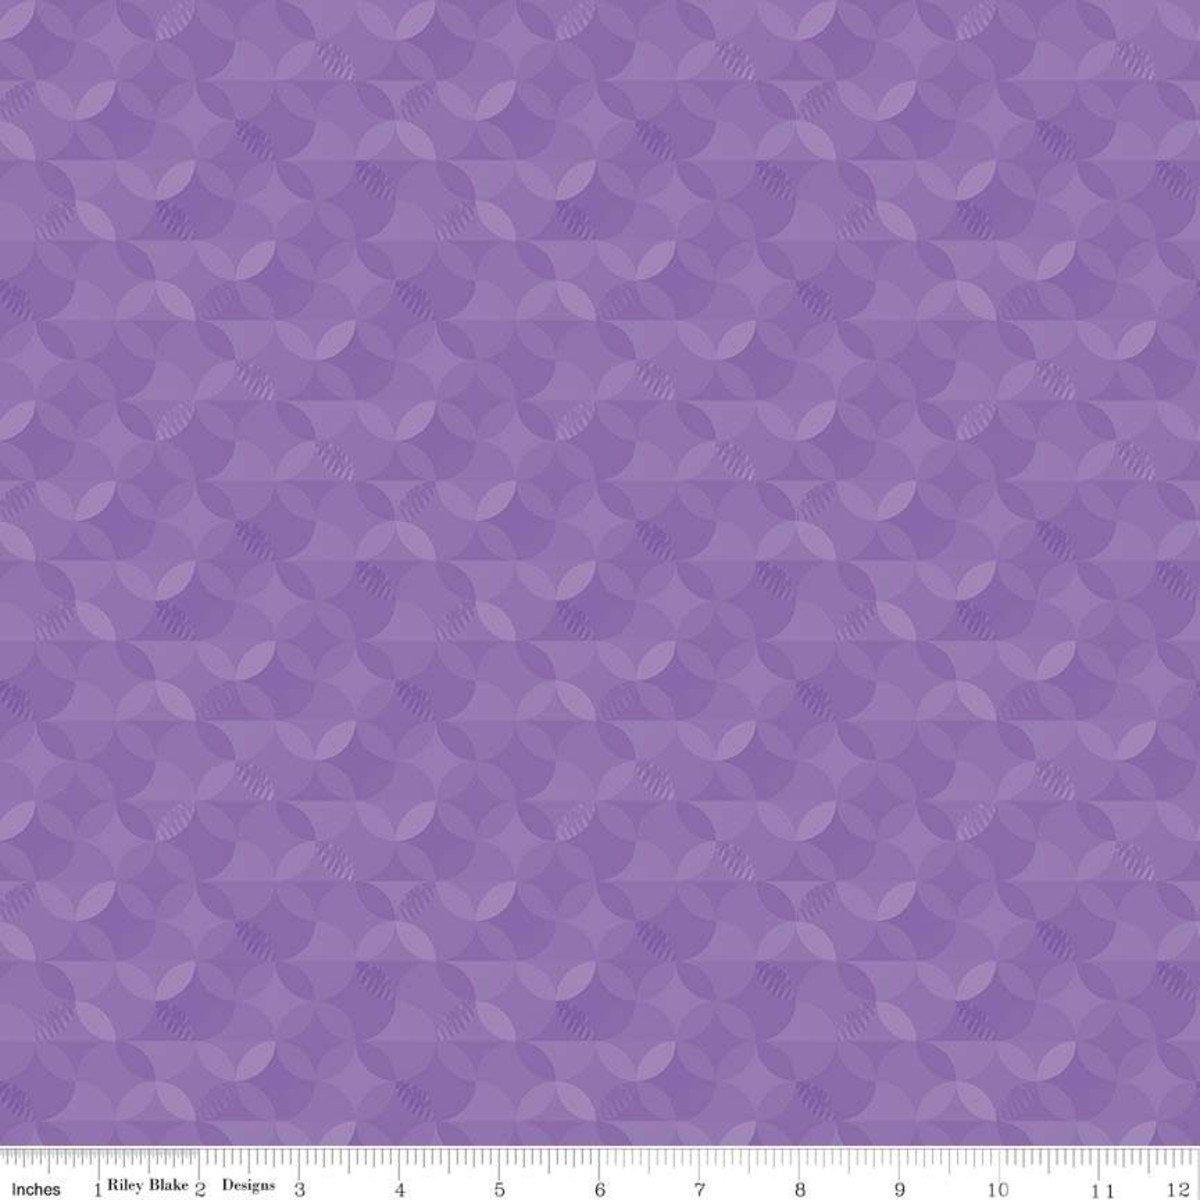 Crayola Kaleidoscope by Riley Blake Fabrics (CR480-VIOLET)